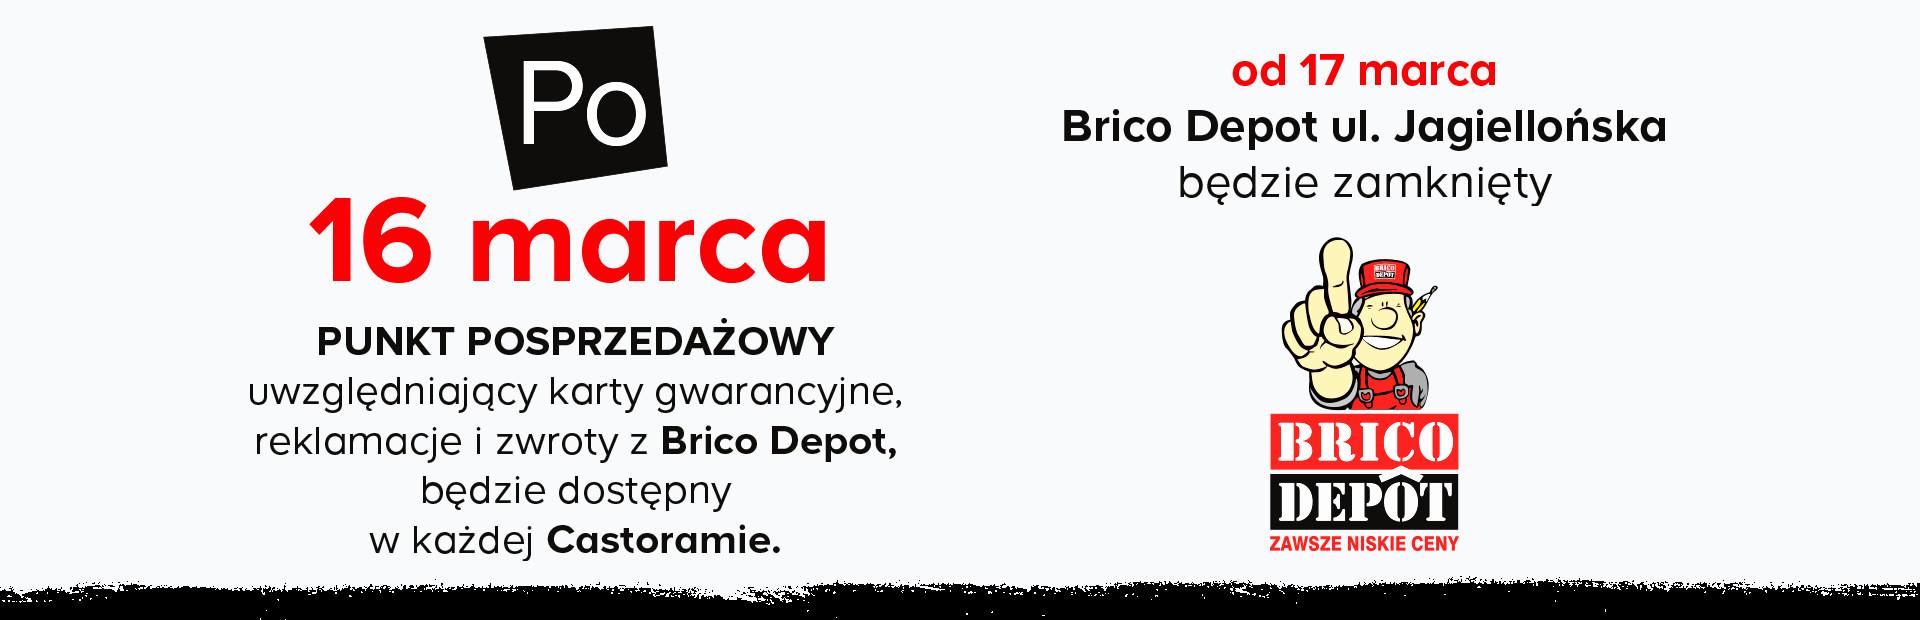 store banne brico depot elegant etendoir a linge e leclerc store banne pas cher brico depot meilleur of store banne brico depot